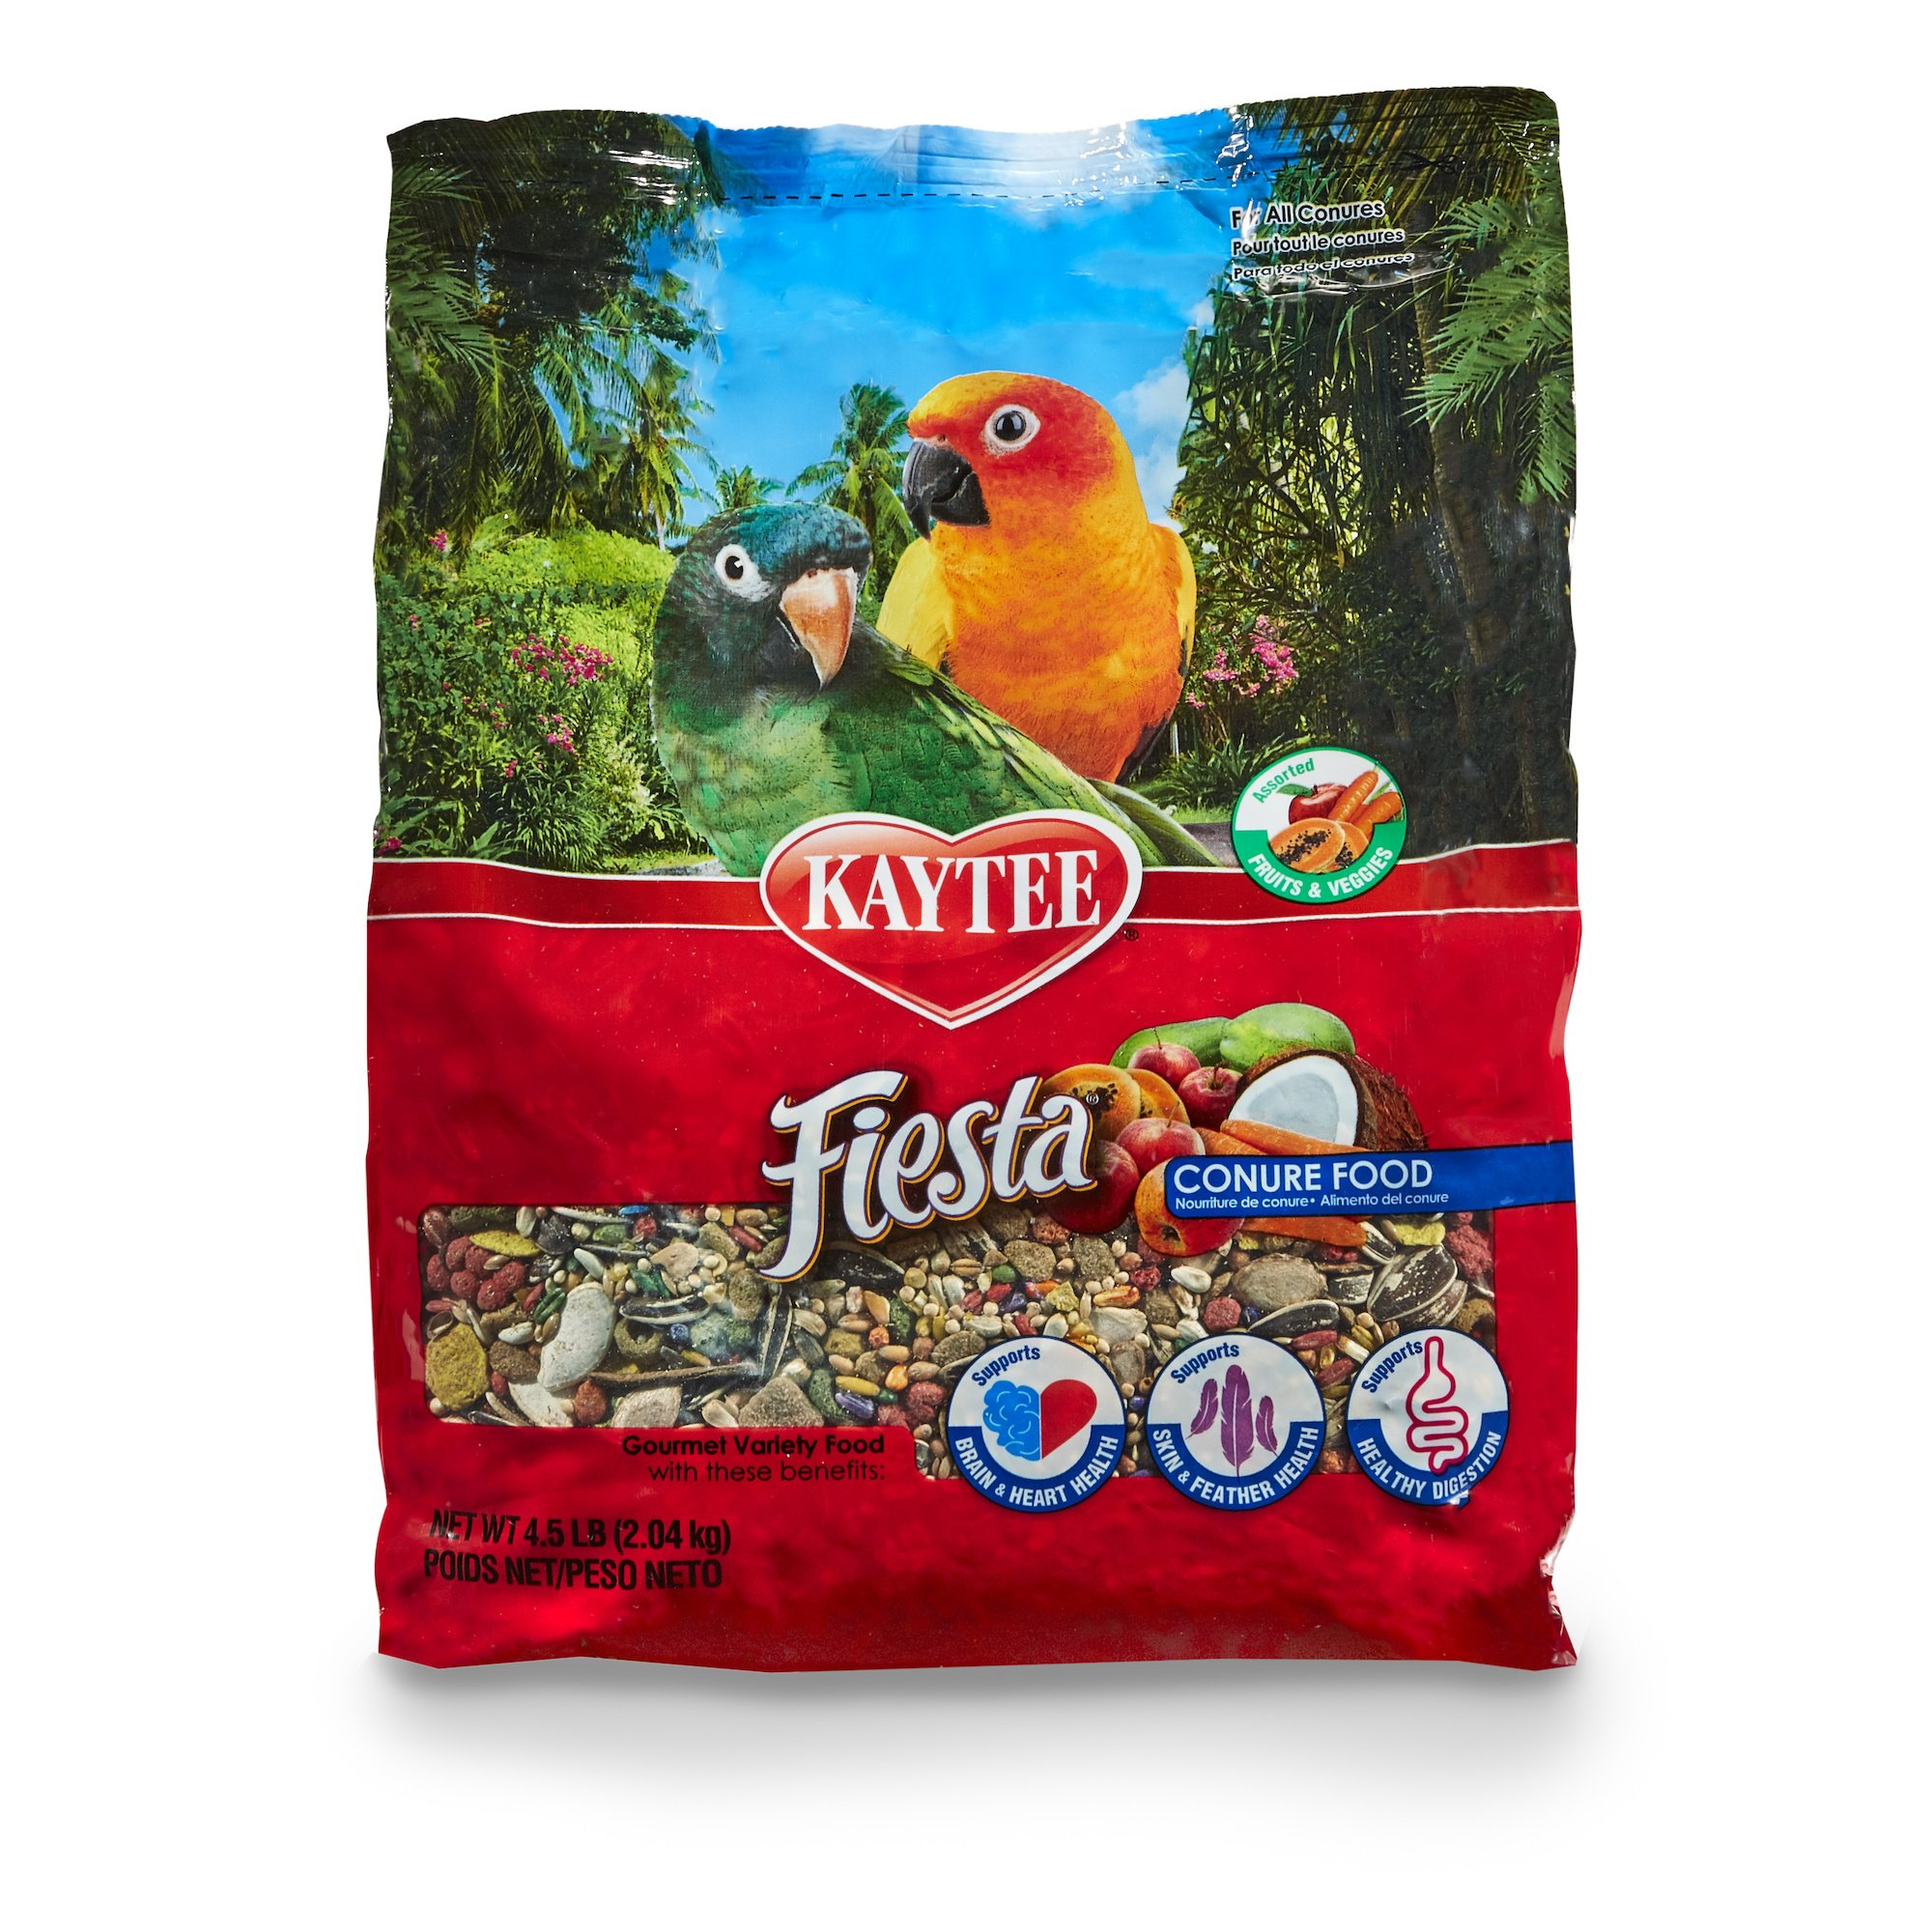 Kaytee Fiesta Gourmet Variety Bird Food For Conures,  4-1/2-Pound Bag by Kaytee